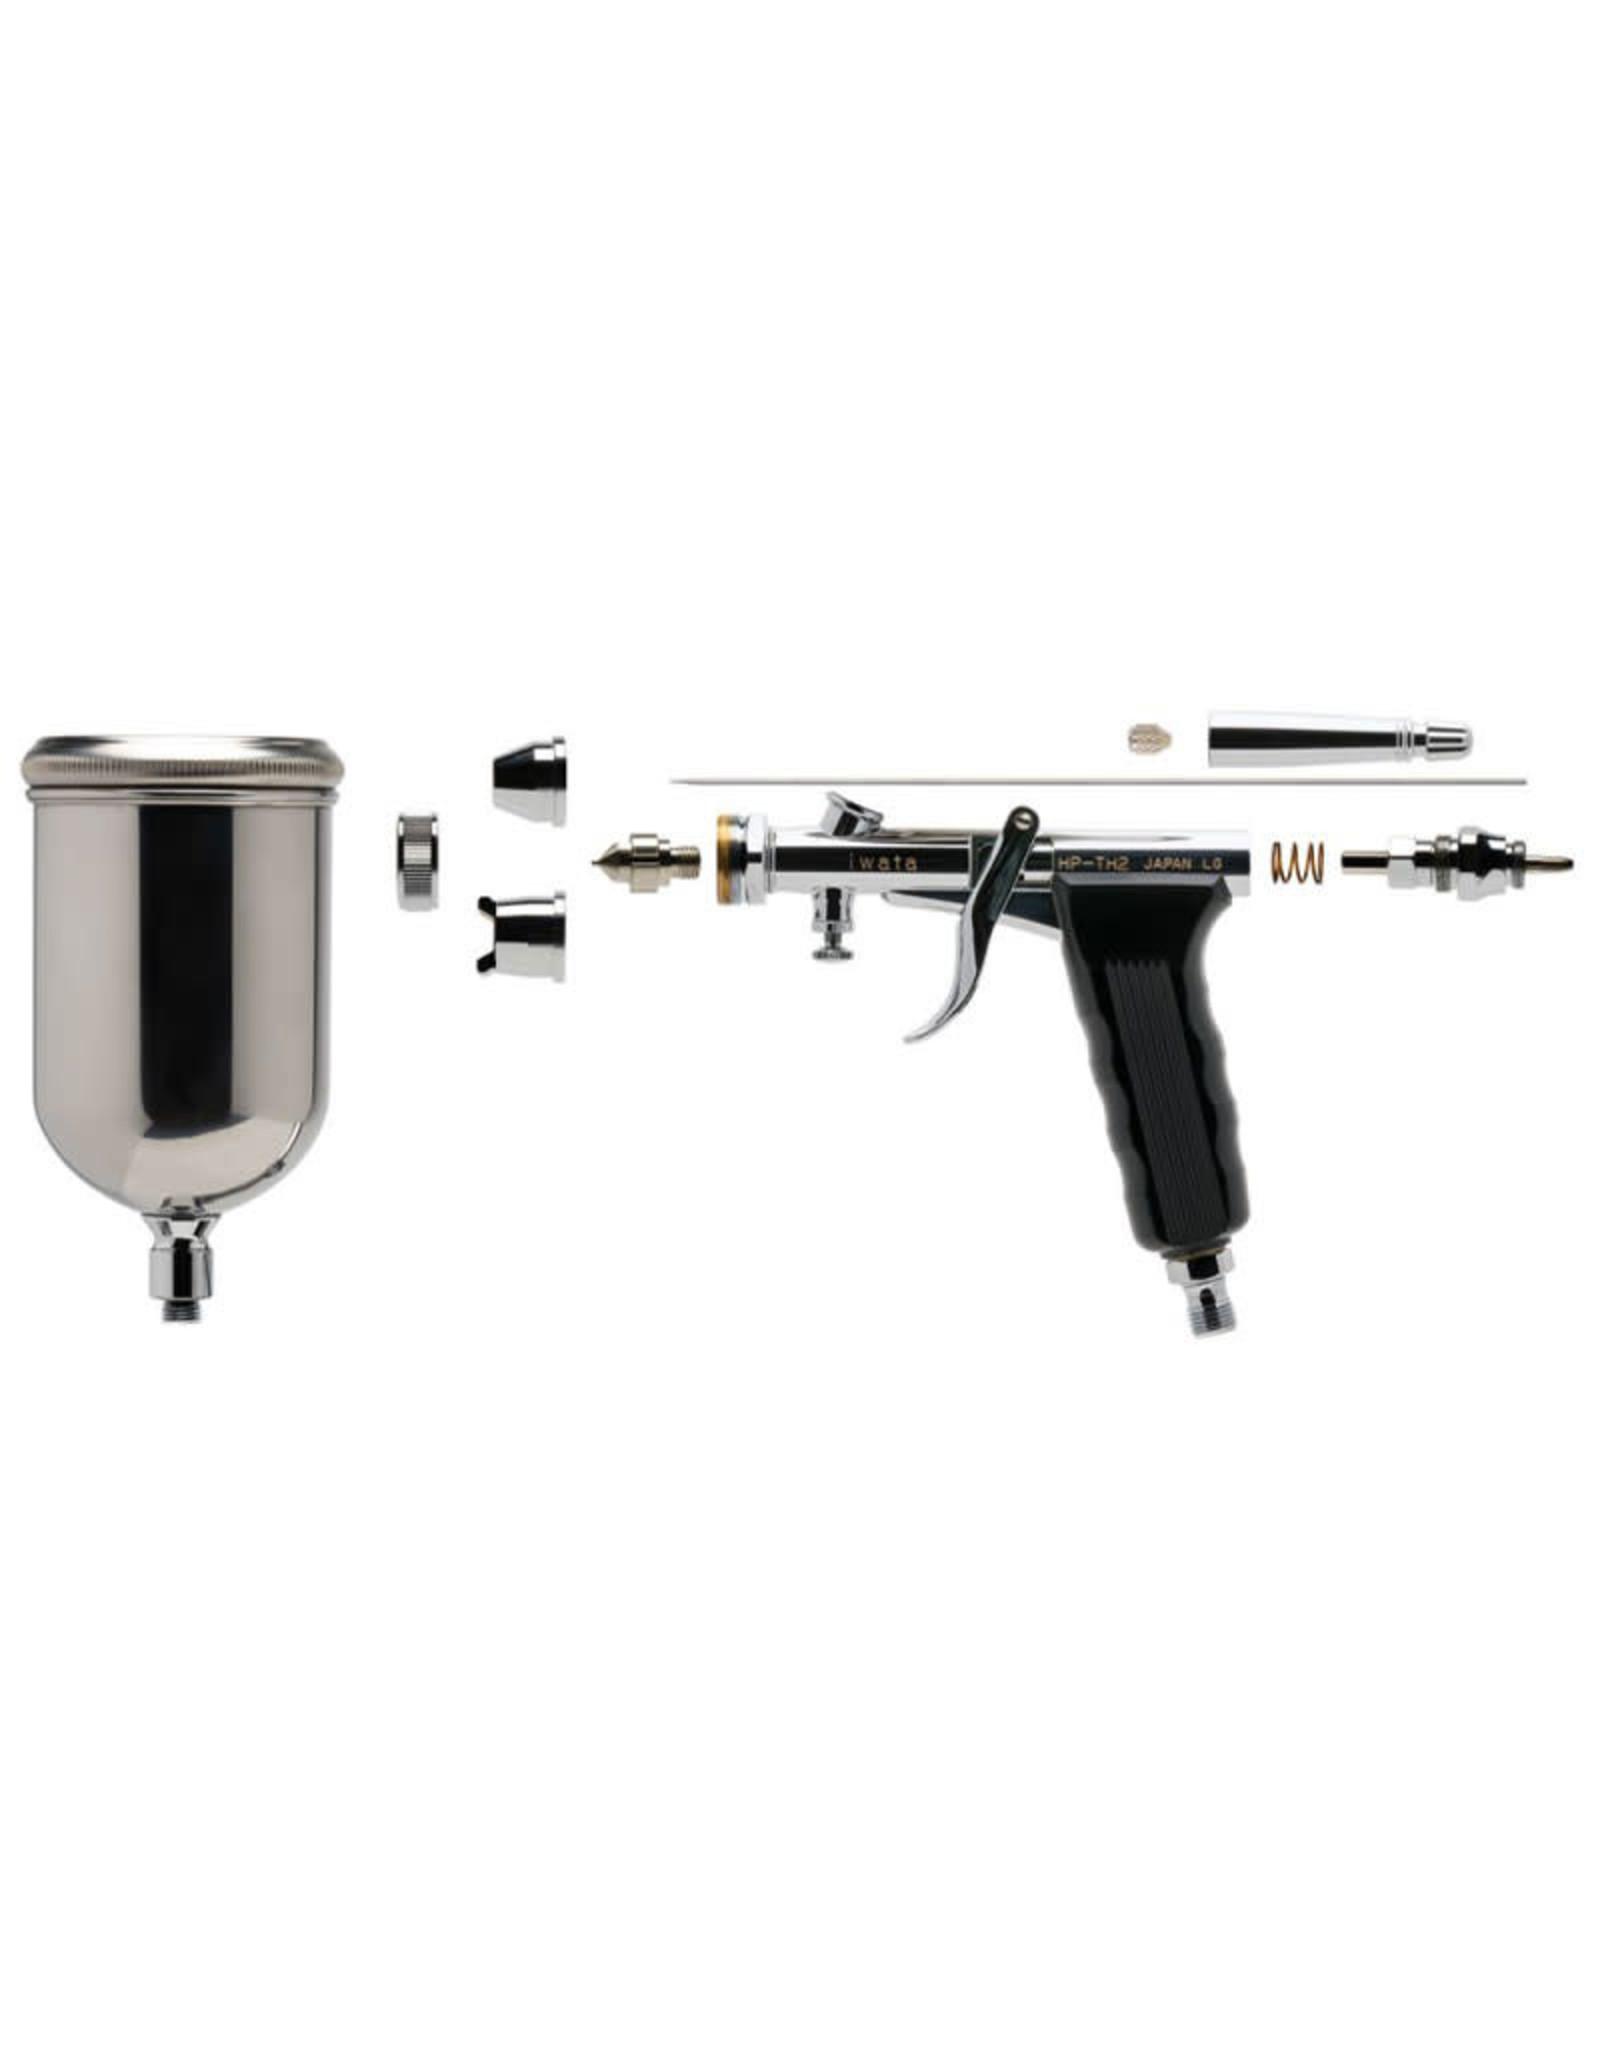 Iwata Iwata Hi-Line HP-TH2 Gravity Feed Dual Action Trigger Airbrush